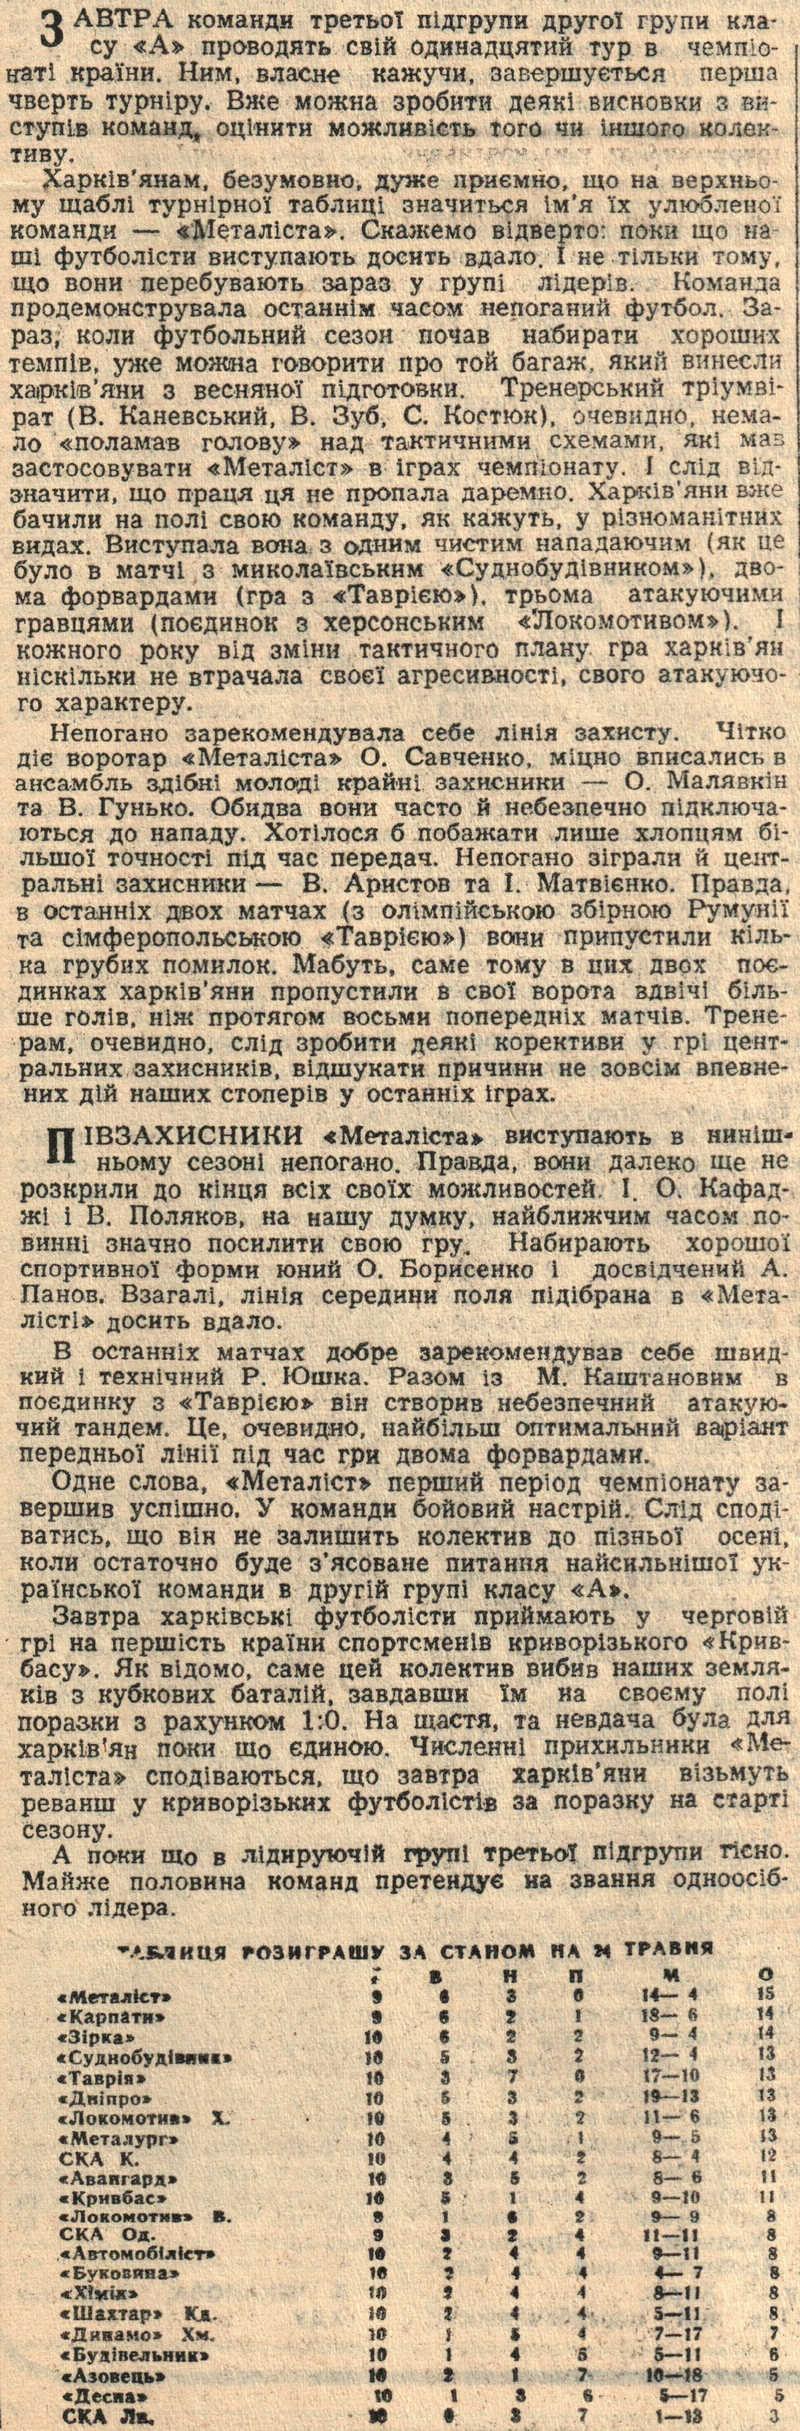 [Изображение: 1969-05-24_MKh-lider-posle-10-turov.jpg]